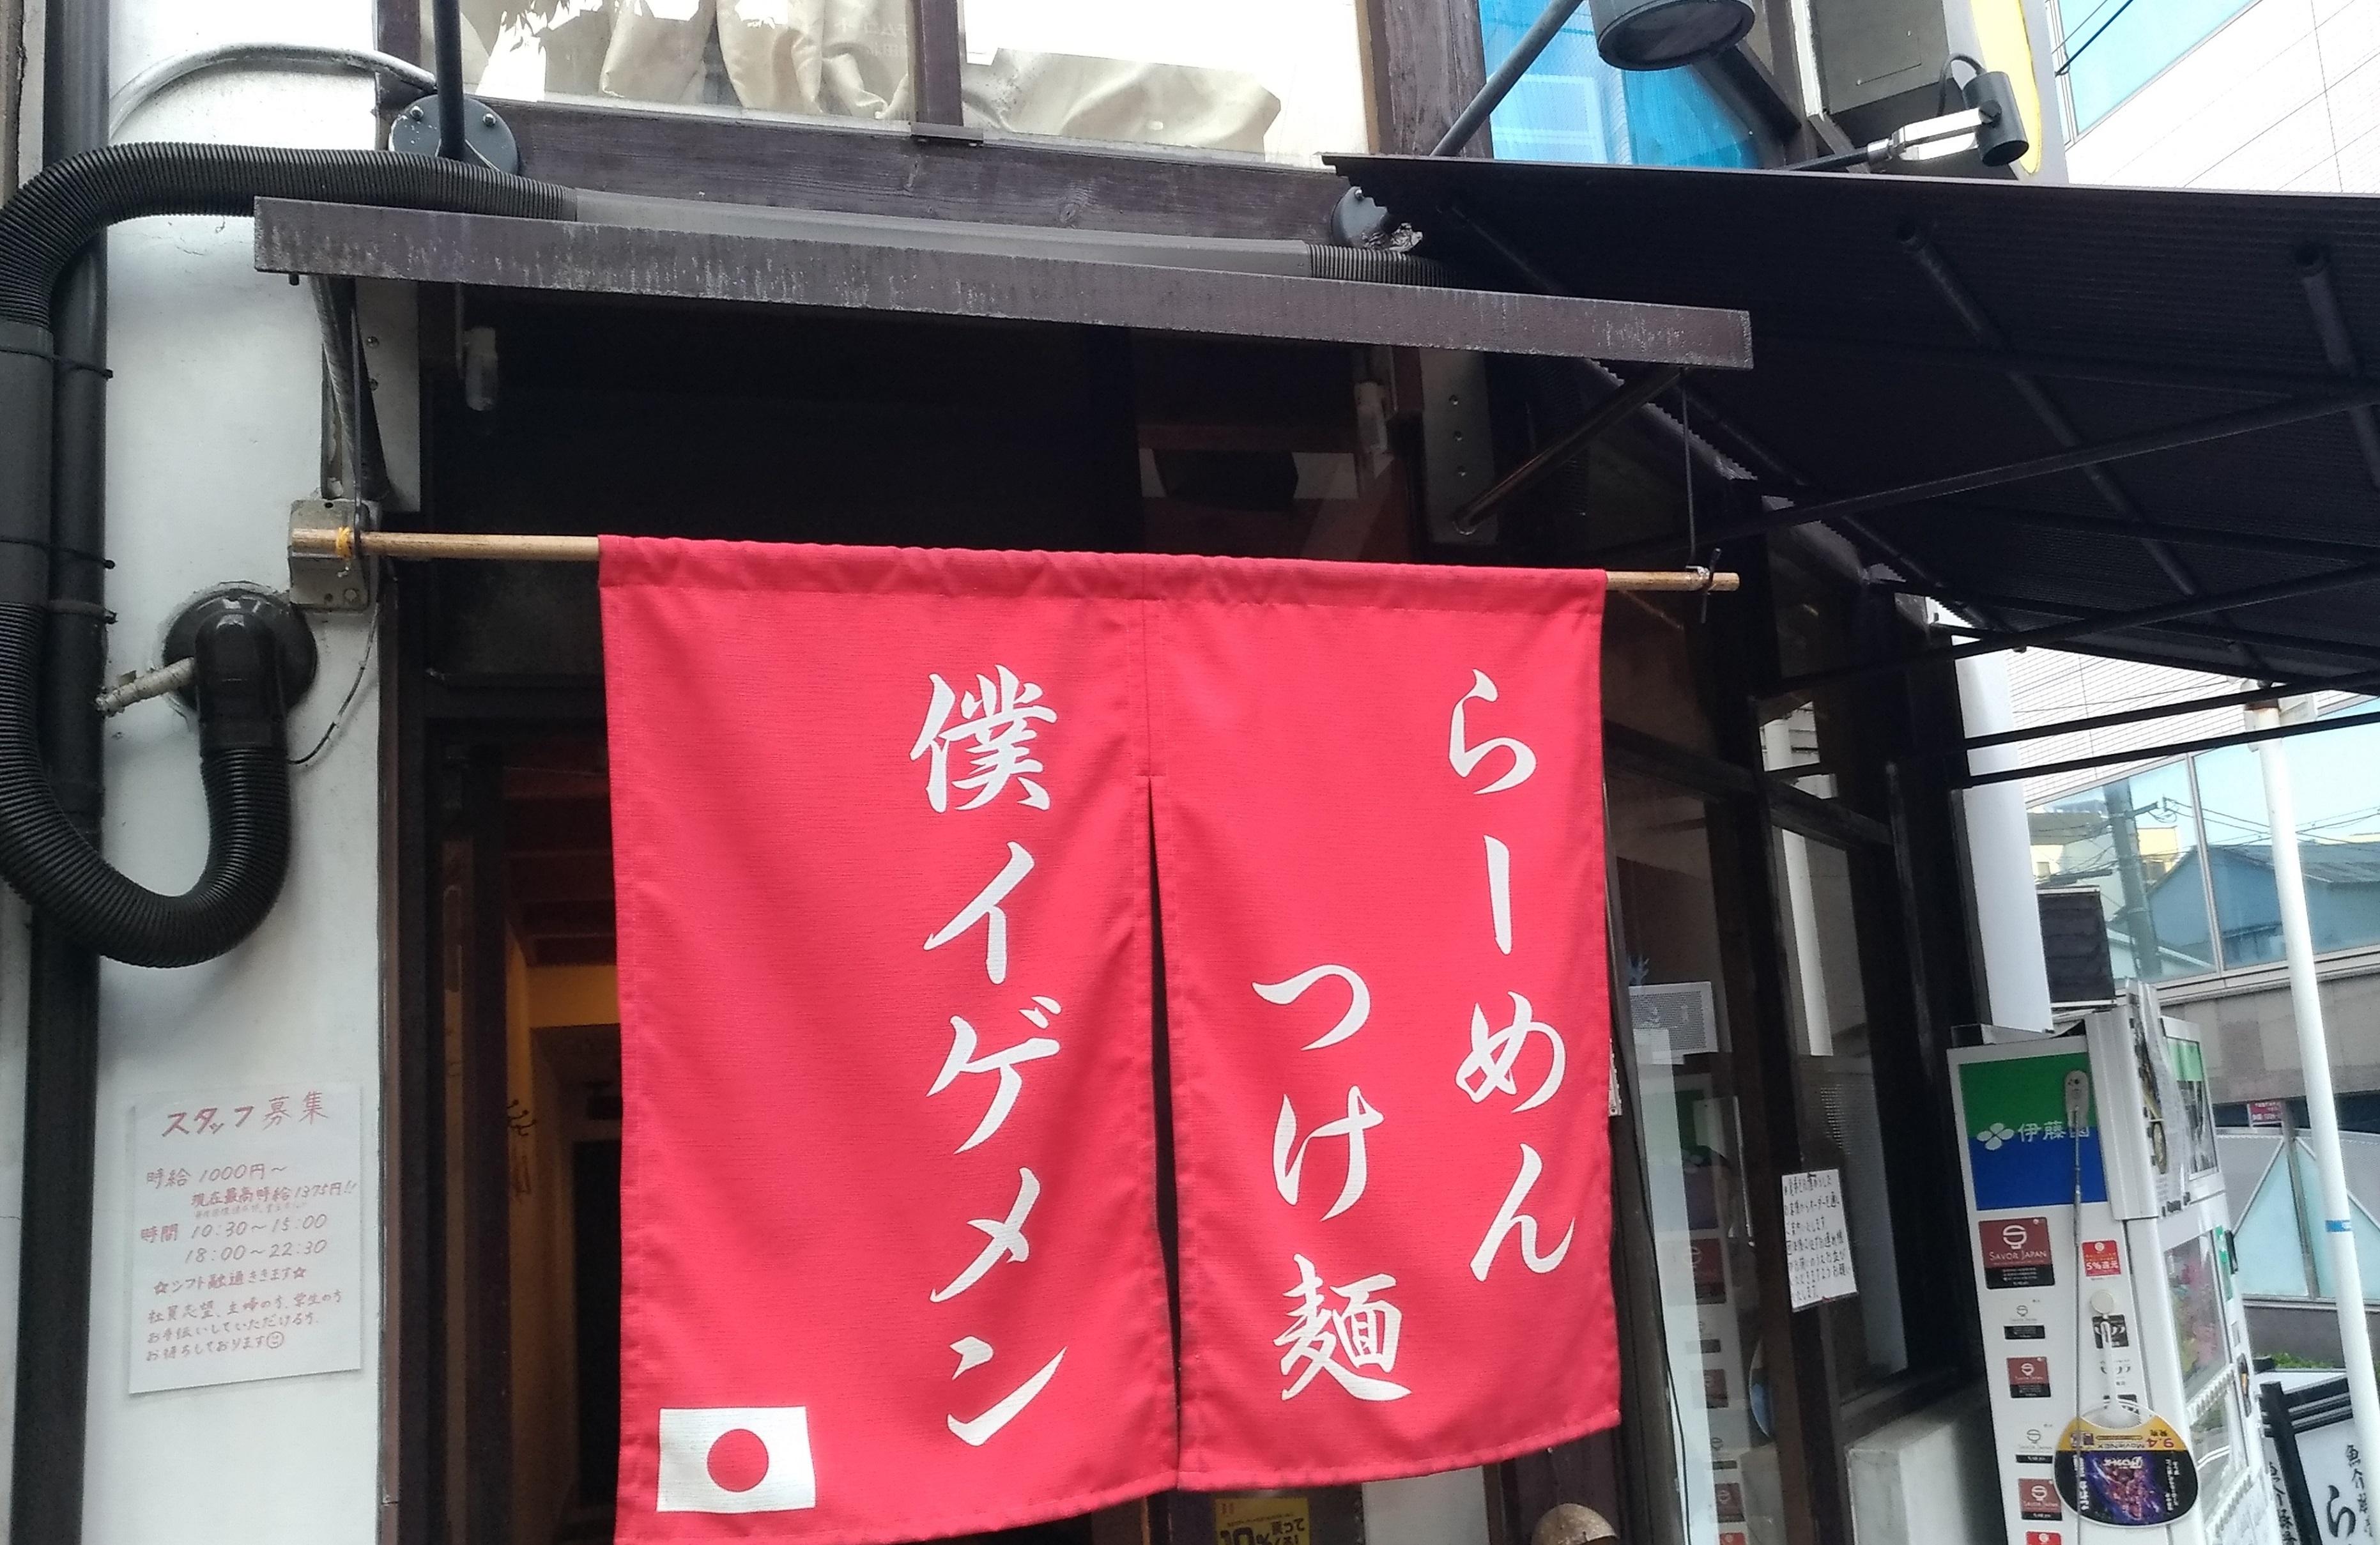 ramen_igei_osaka_oyodo_takeout_3.jpg